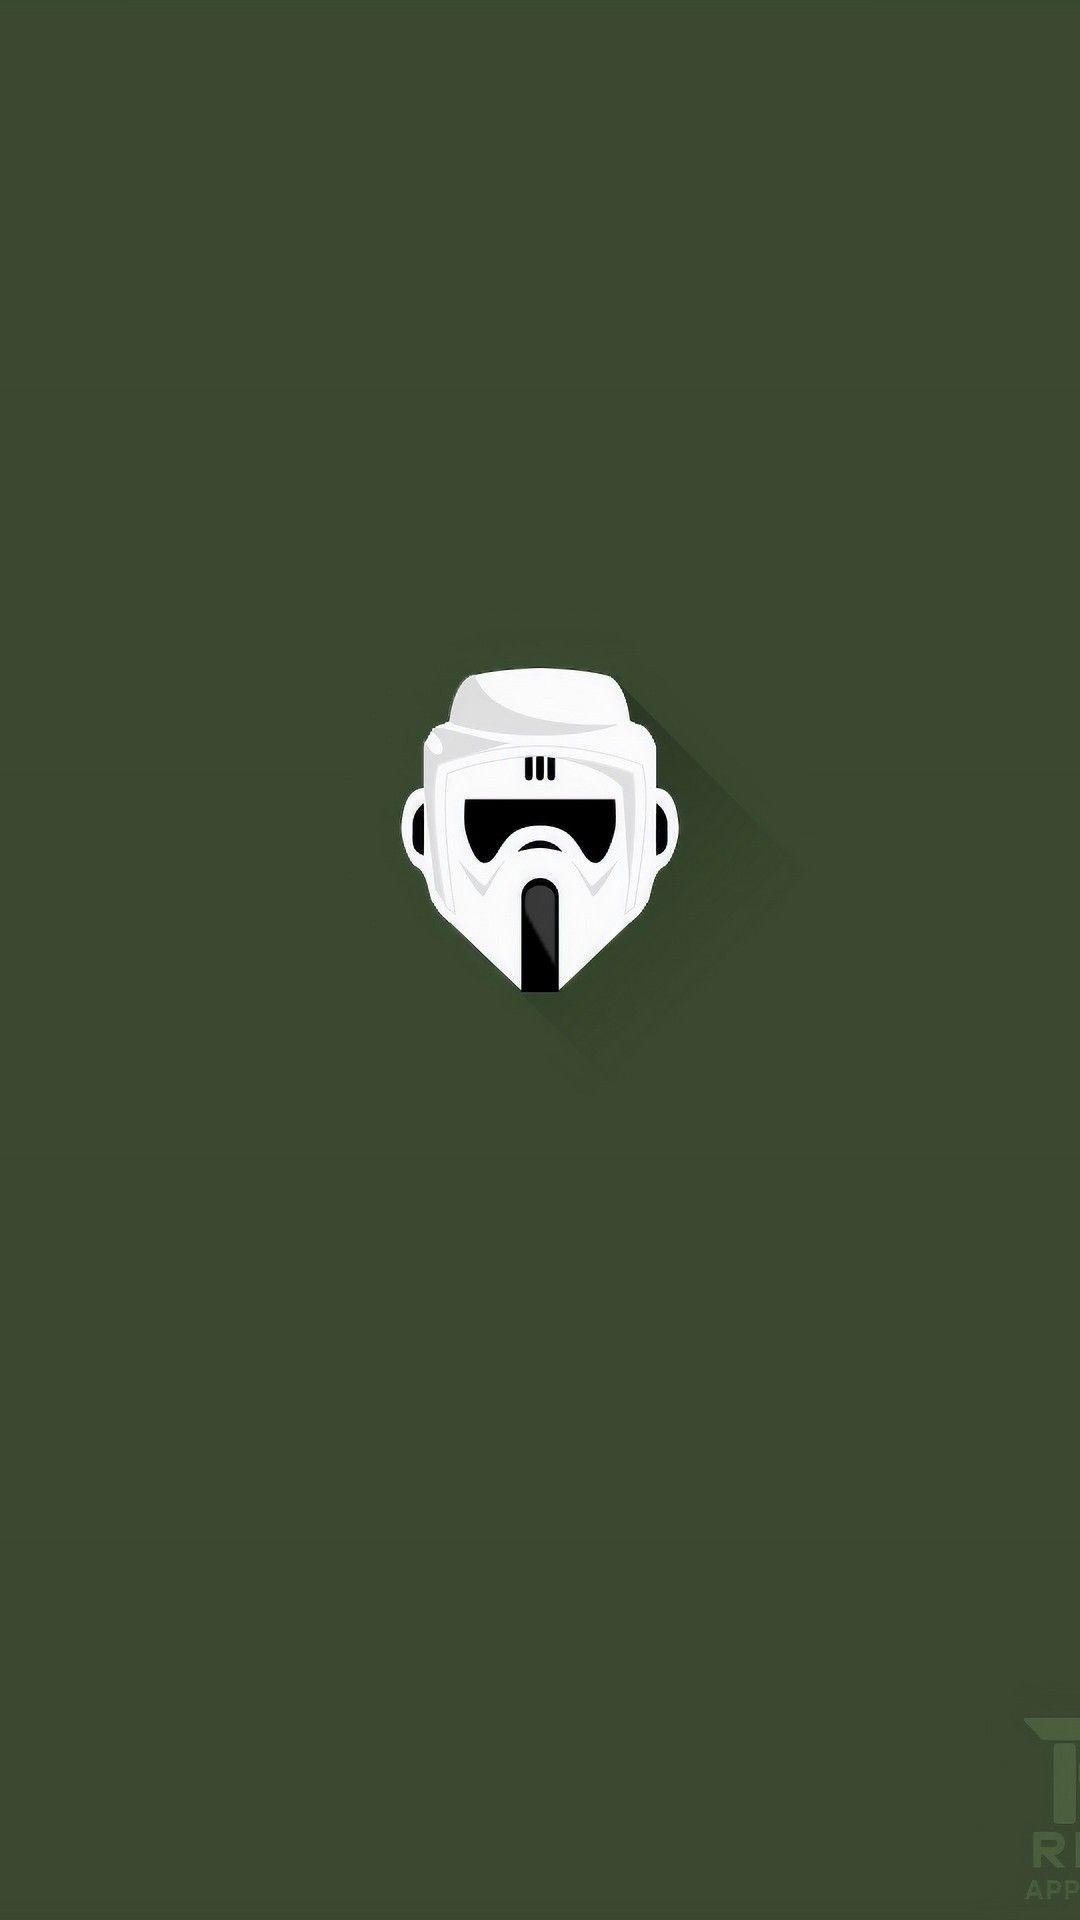 Scout Trooper Minimalist